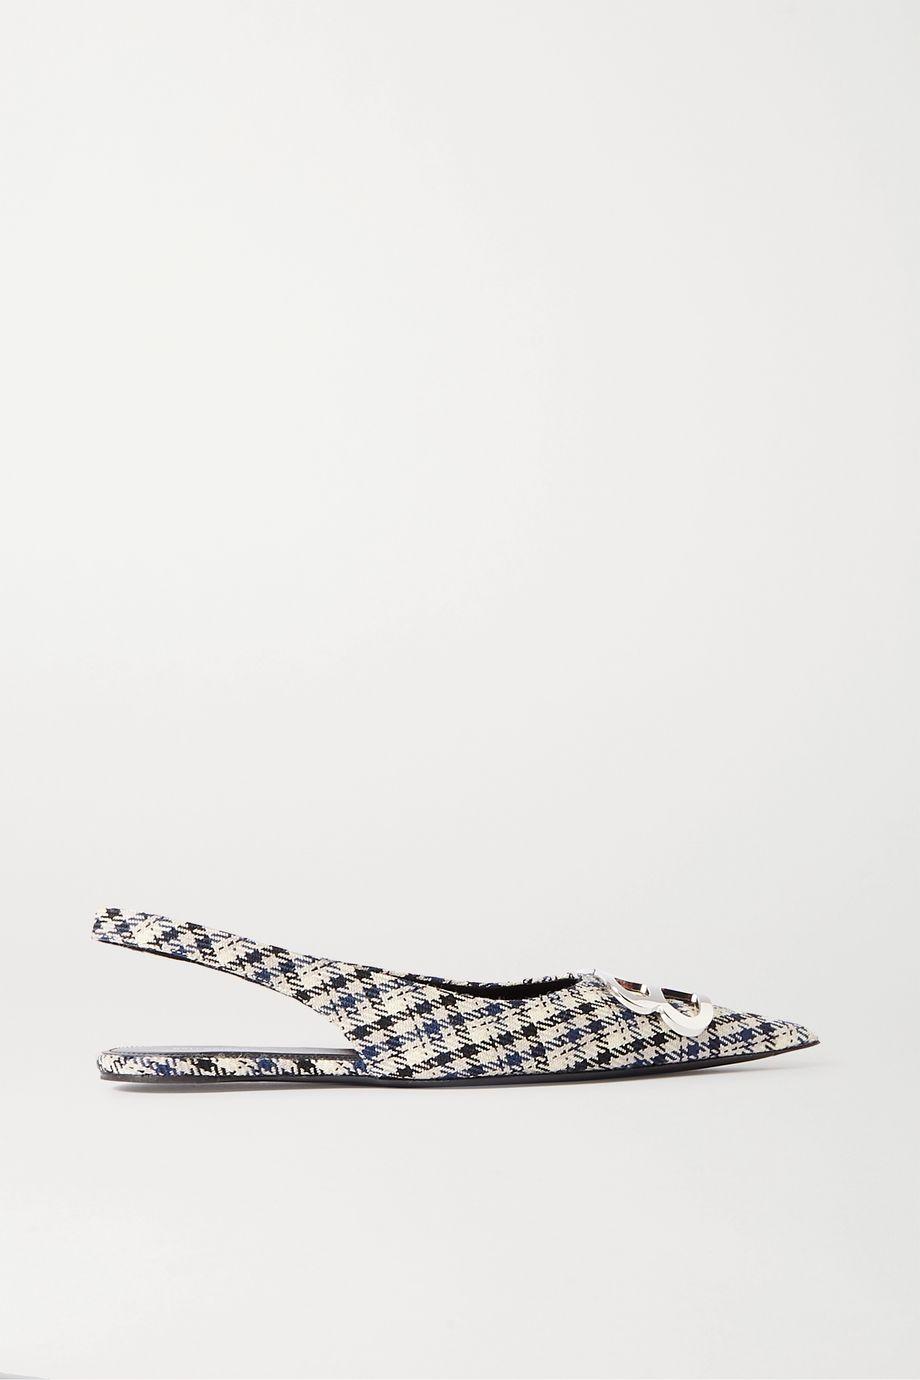 Balenciaga Knife logo-embellished checked wool slingback point-toe flats